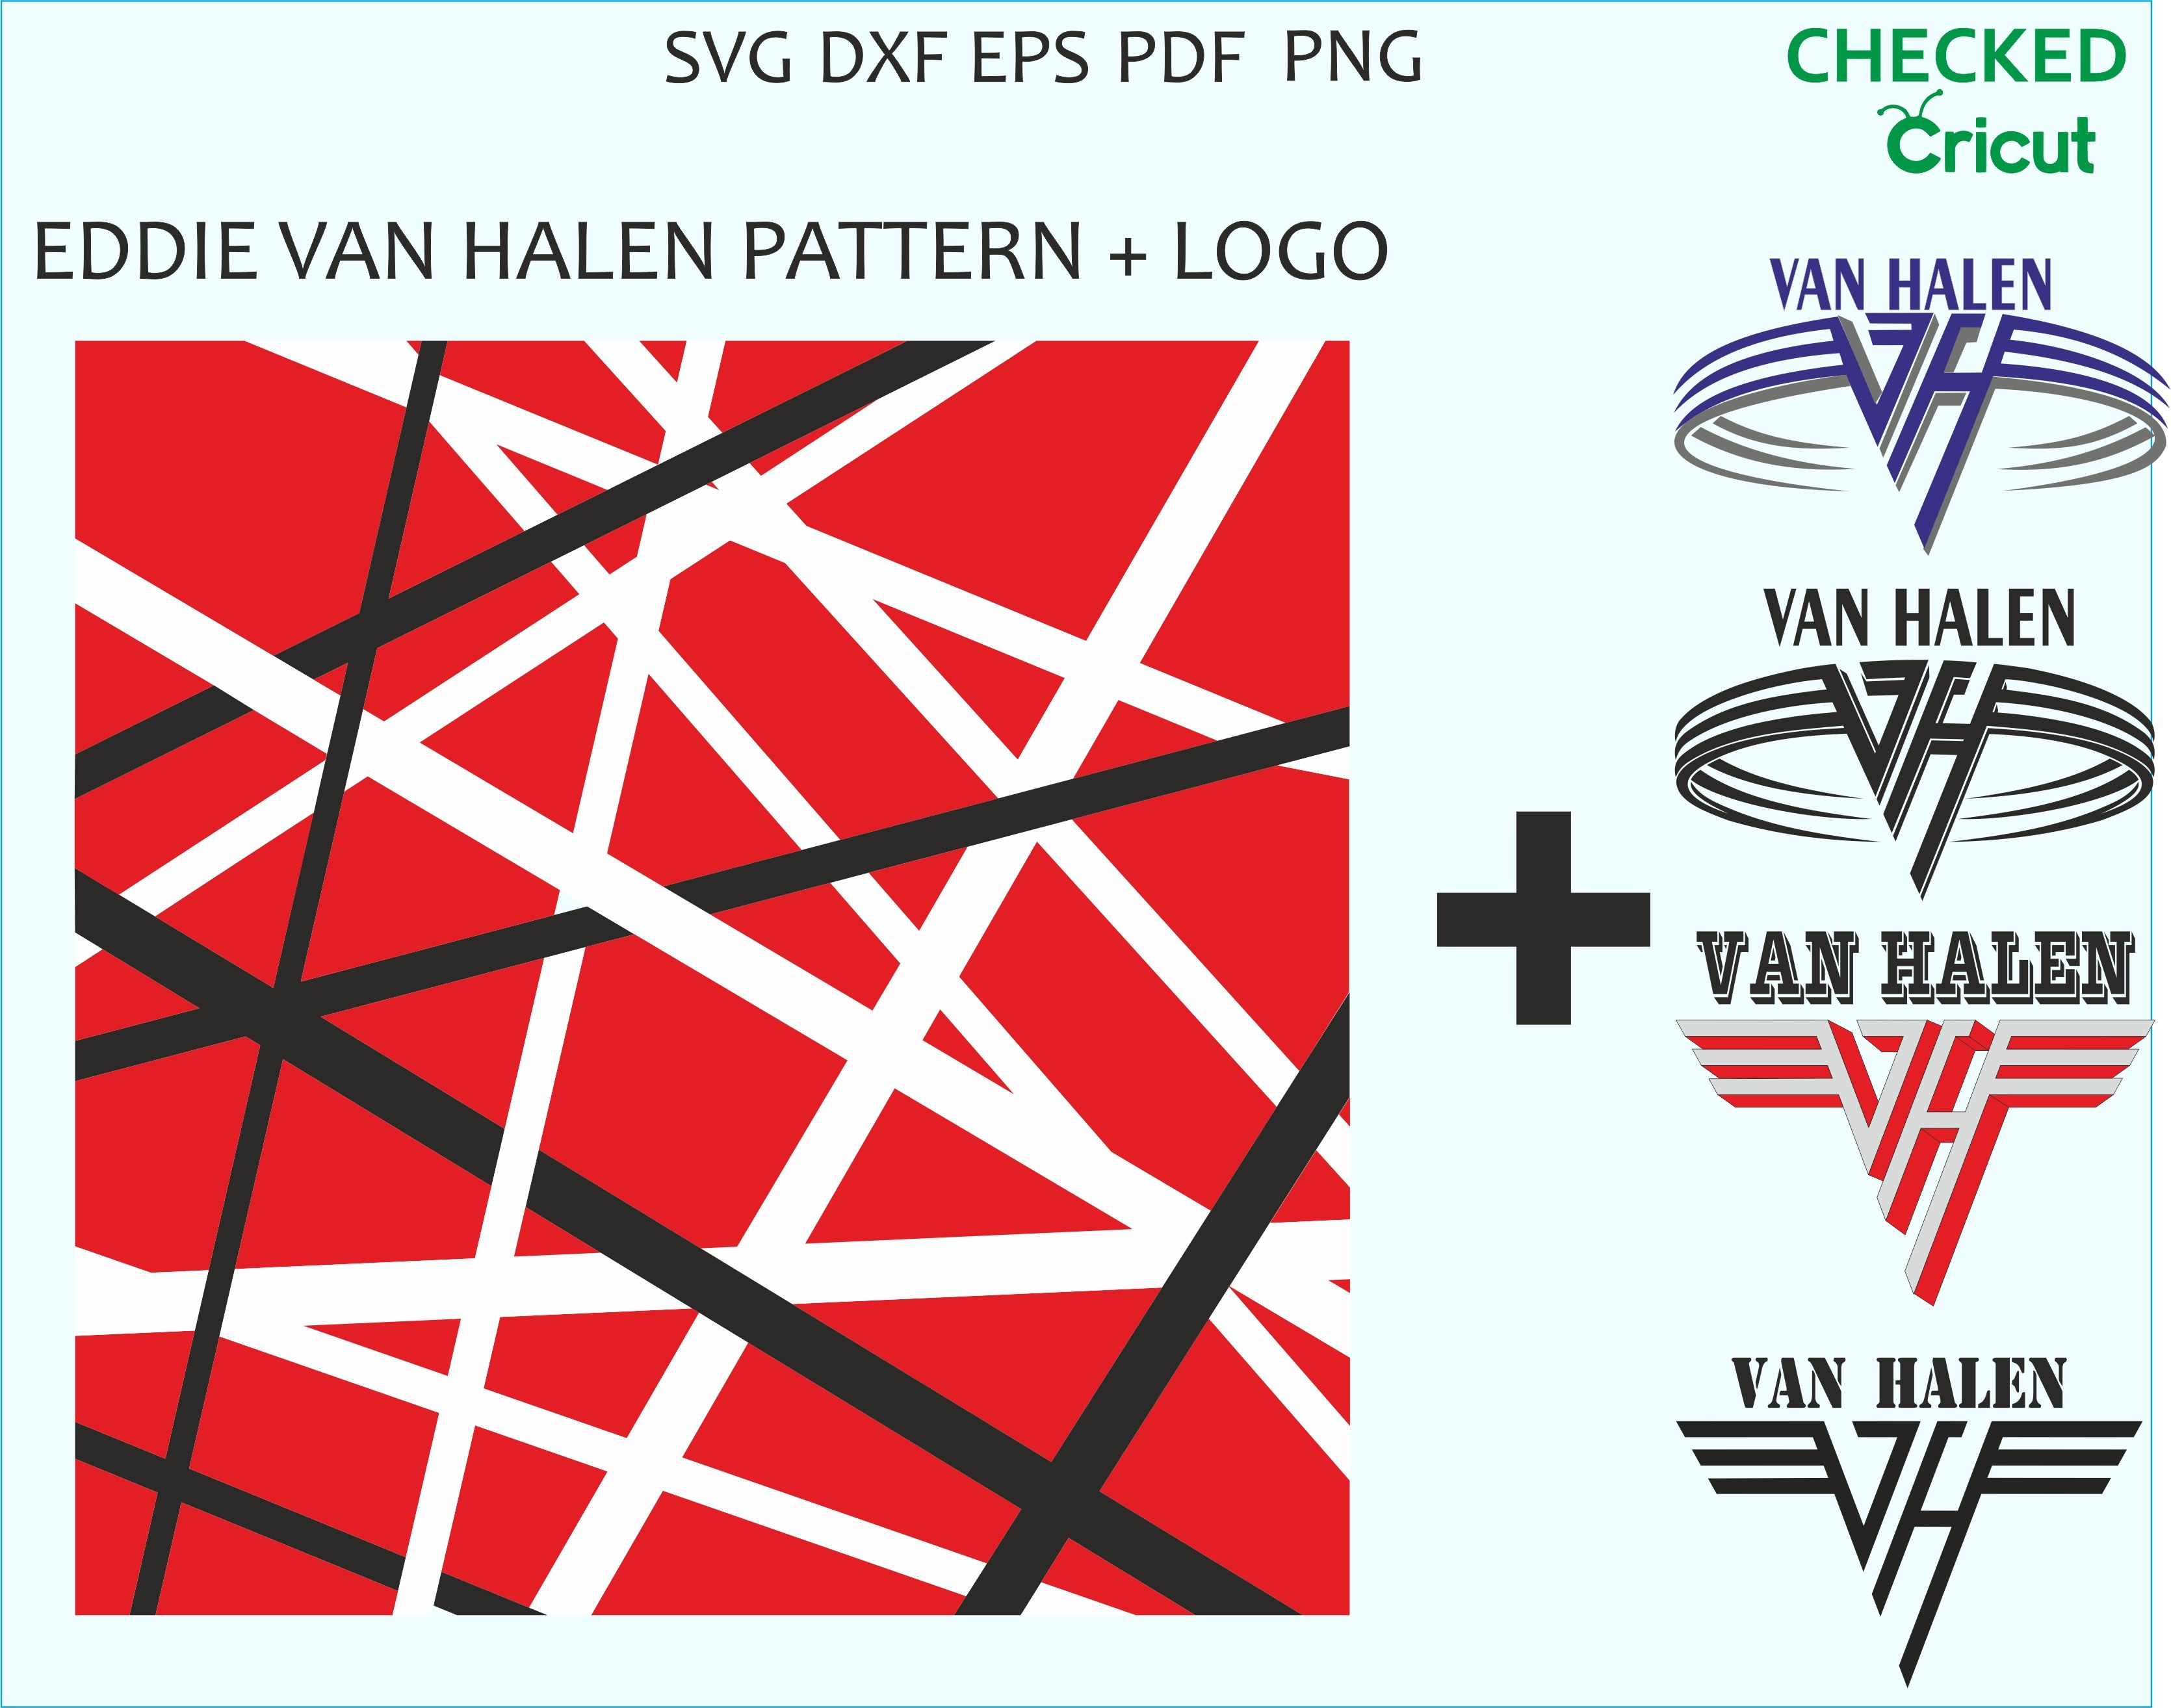 Eddie Van Halen Pattern Svg Eps Png Eddie Van Halen Guitar Patterns Van Halen